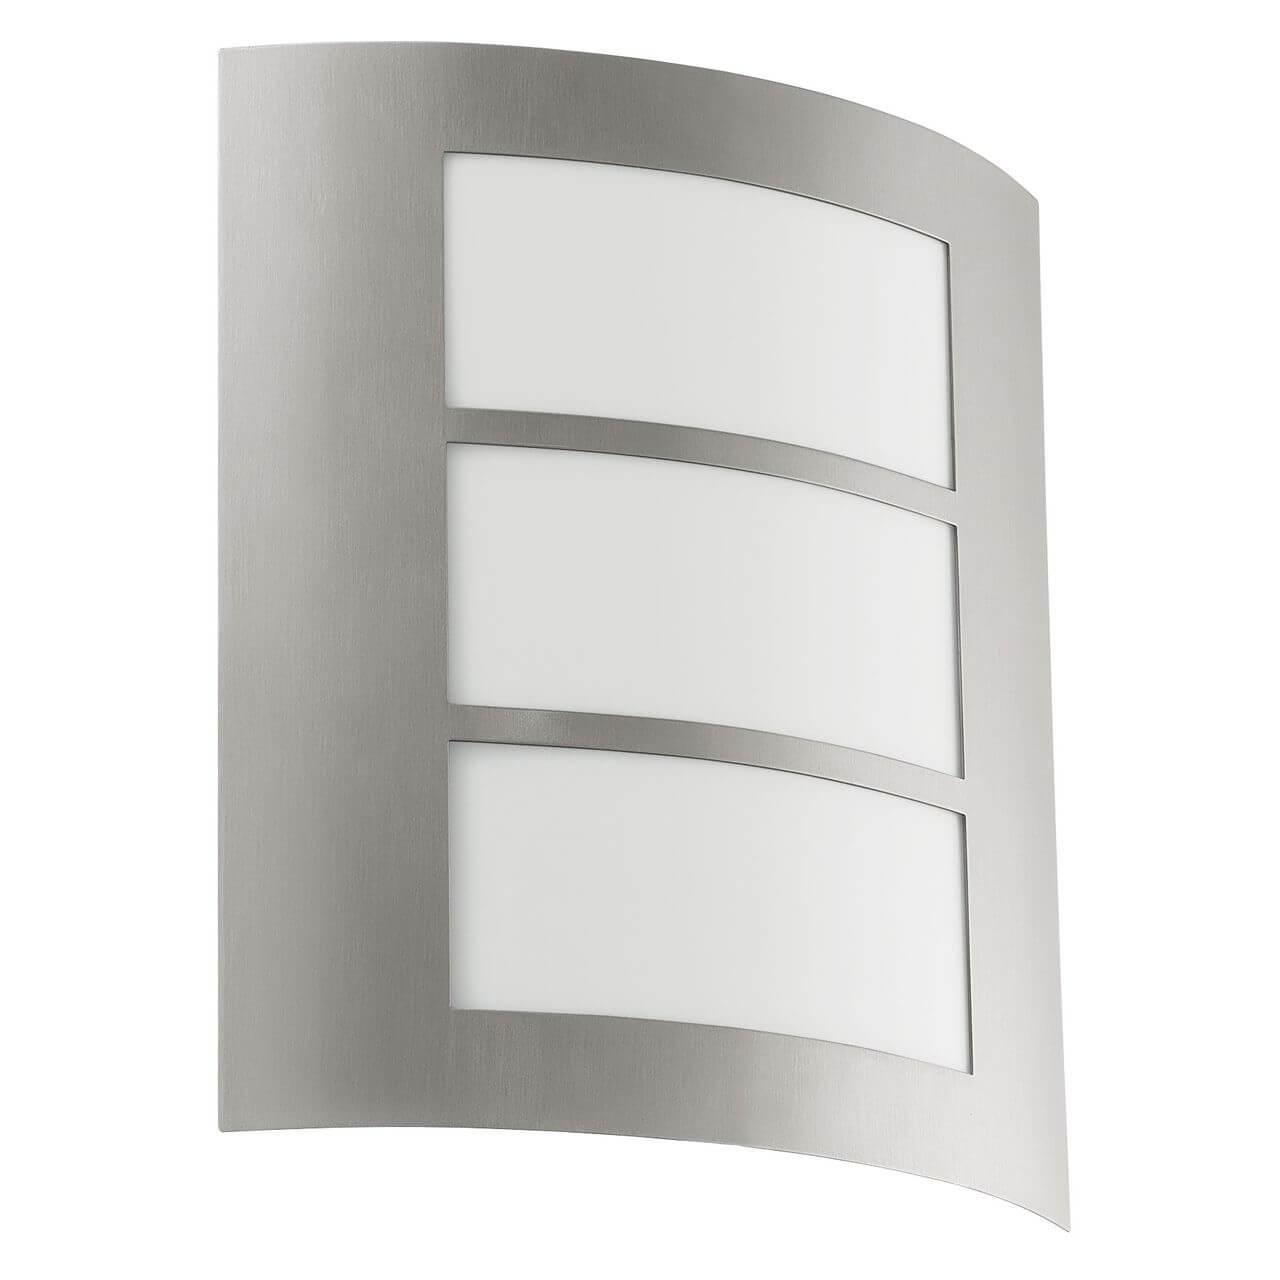 Уличный светильник Eglo 88139, E27 цена